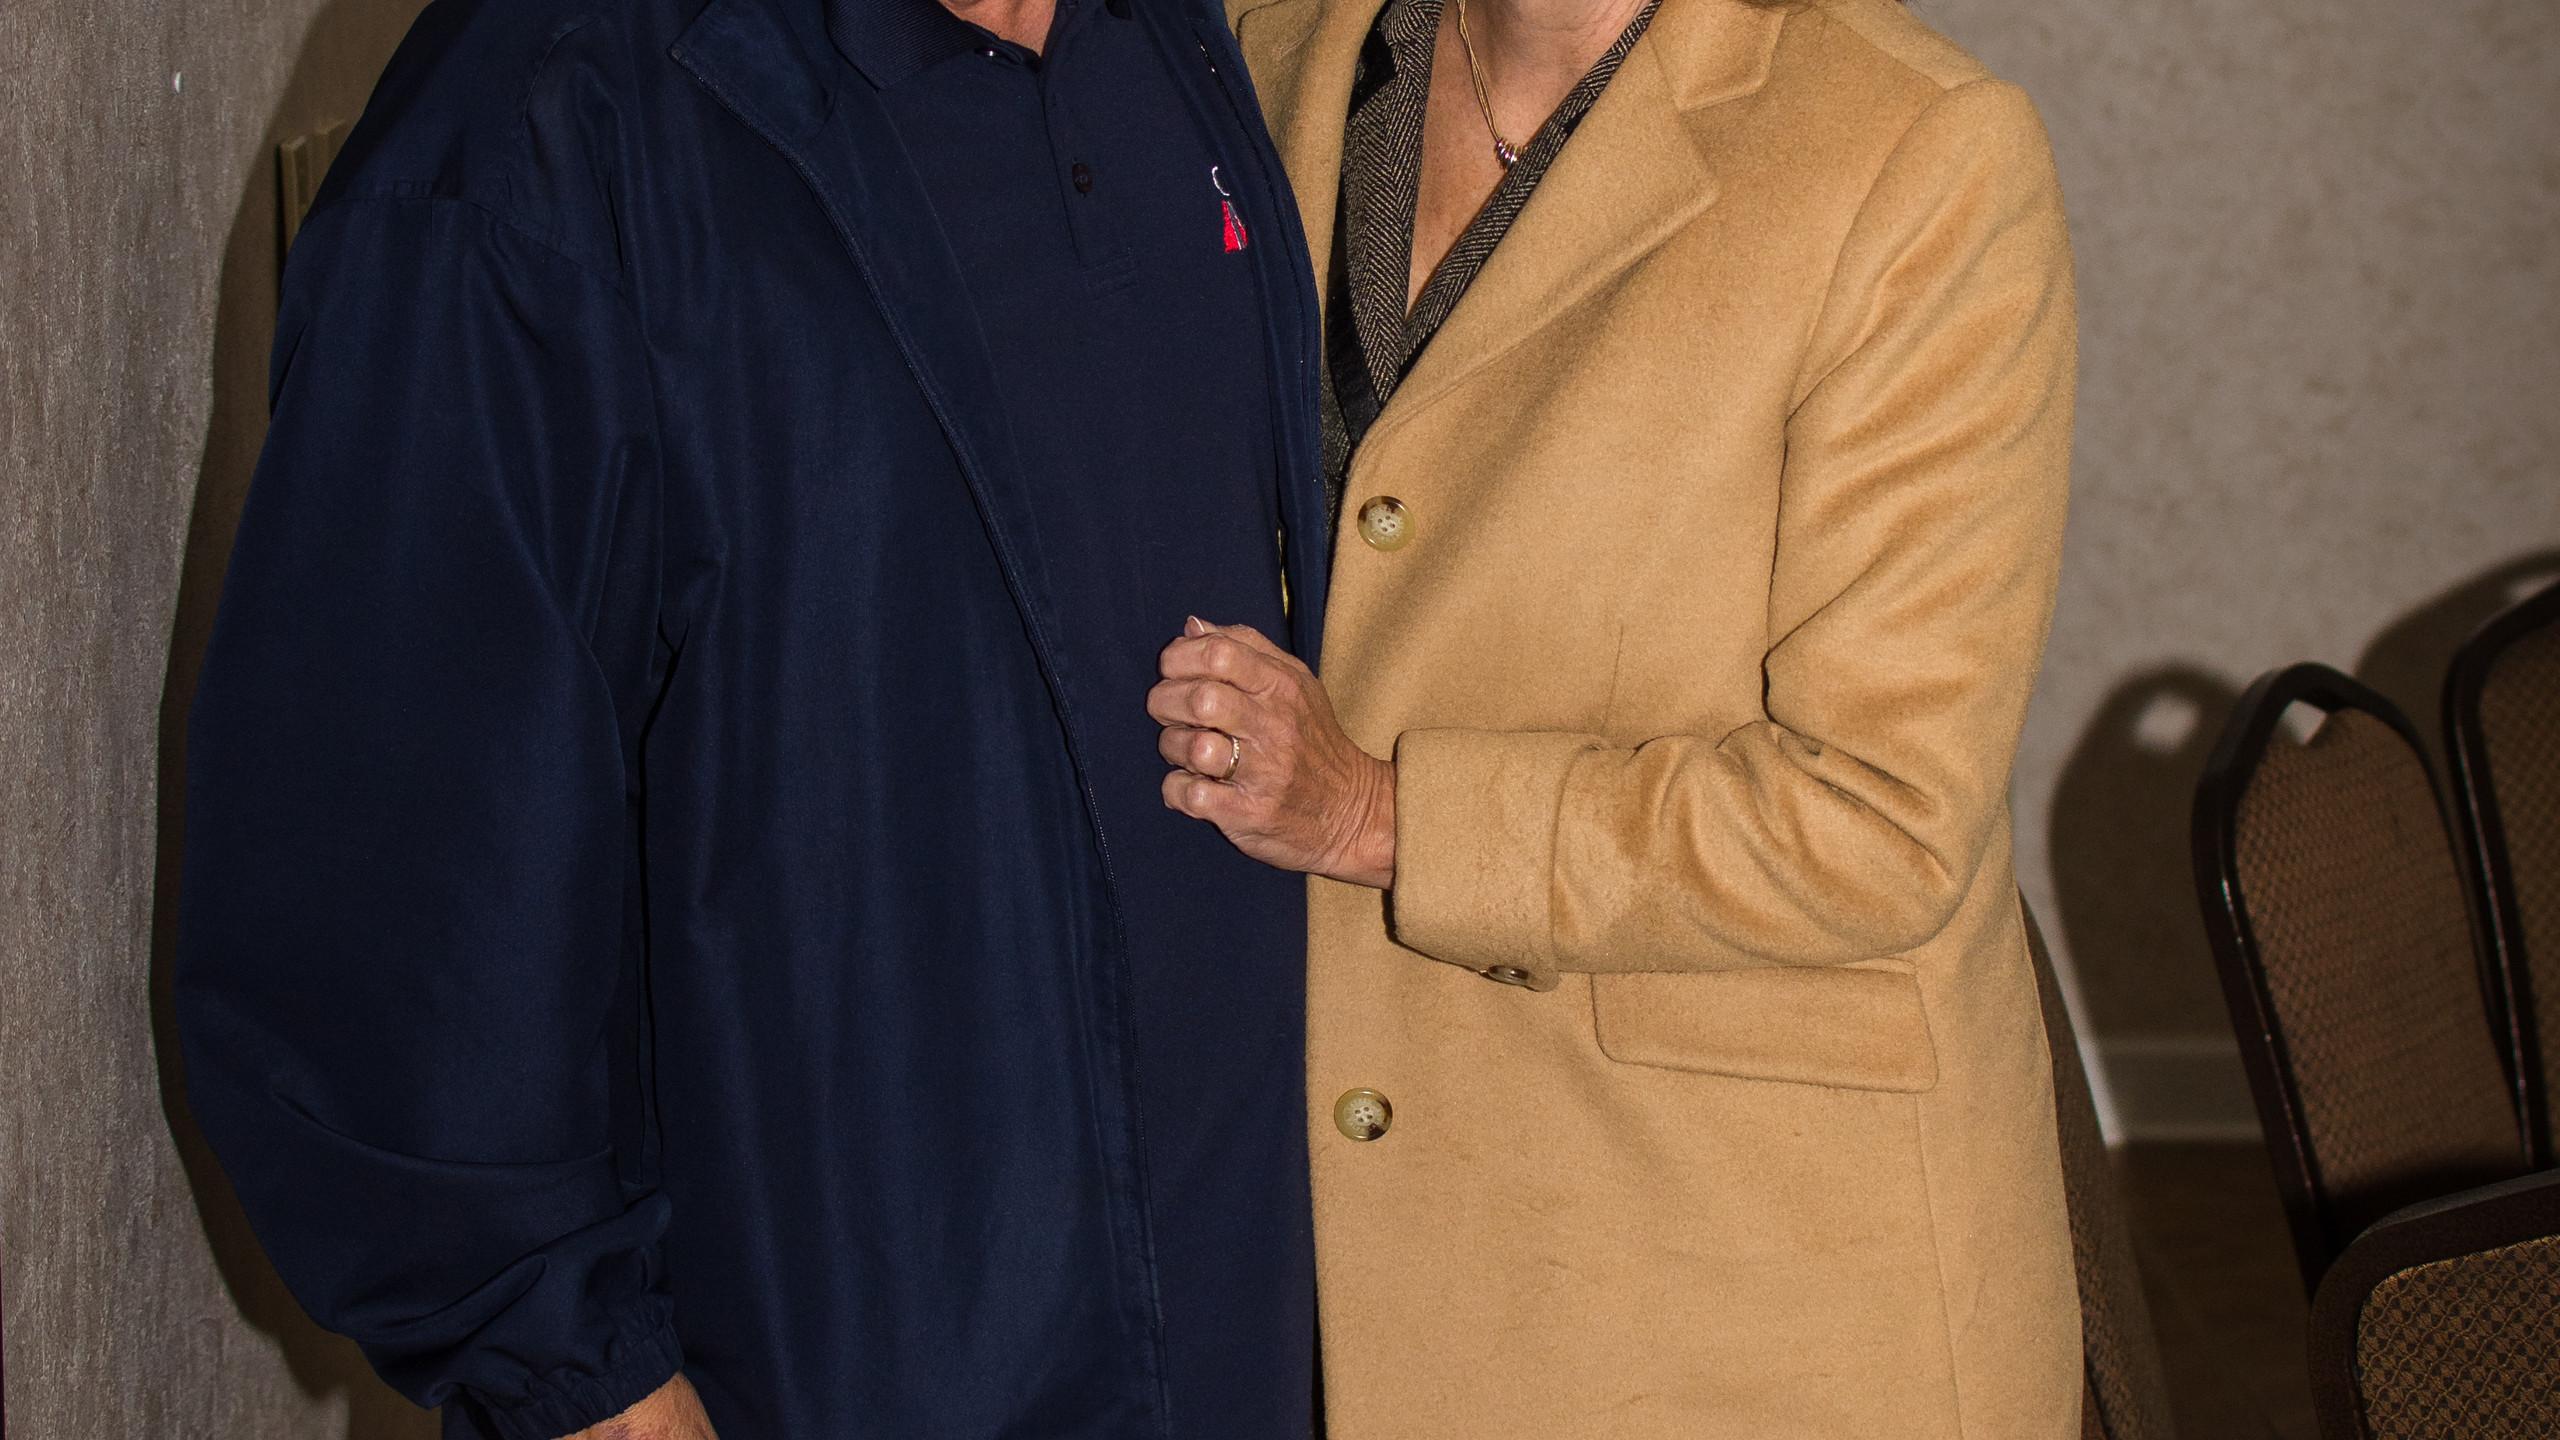 Lee Irwin and Cindy Chambers